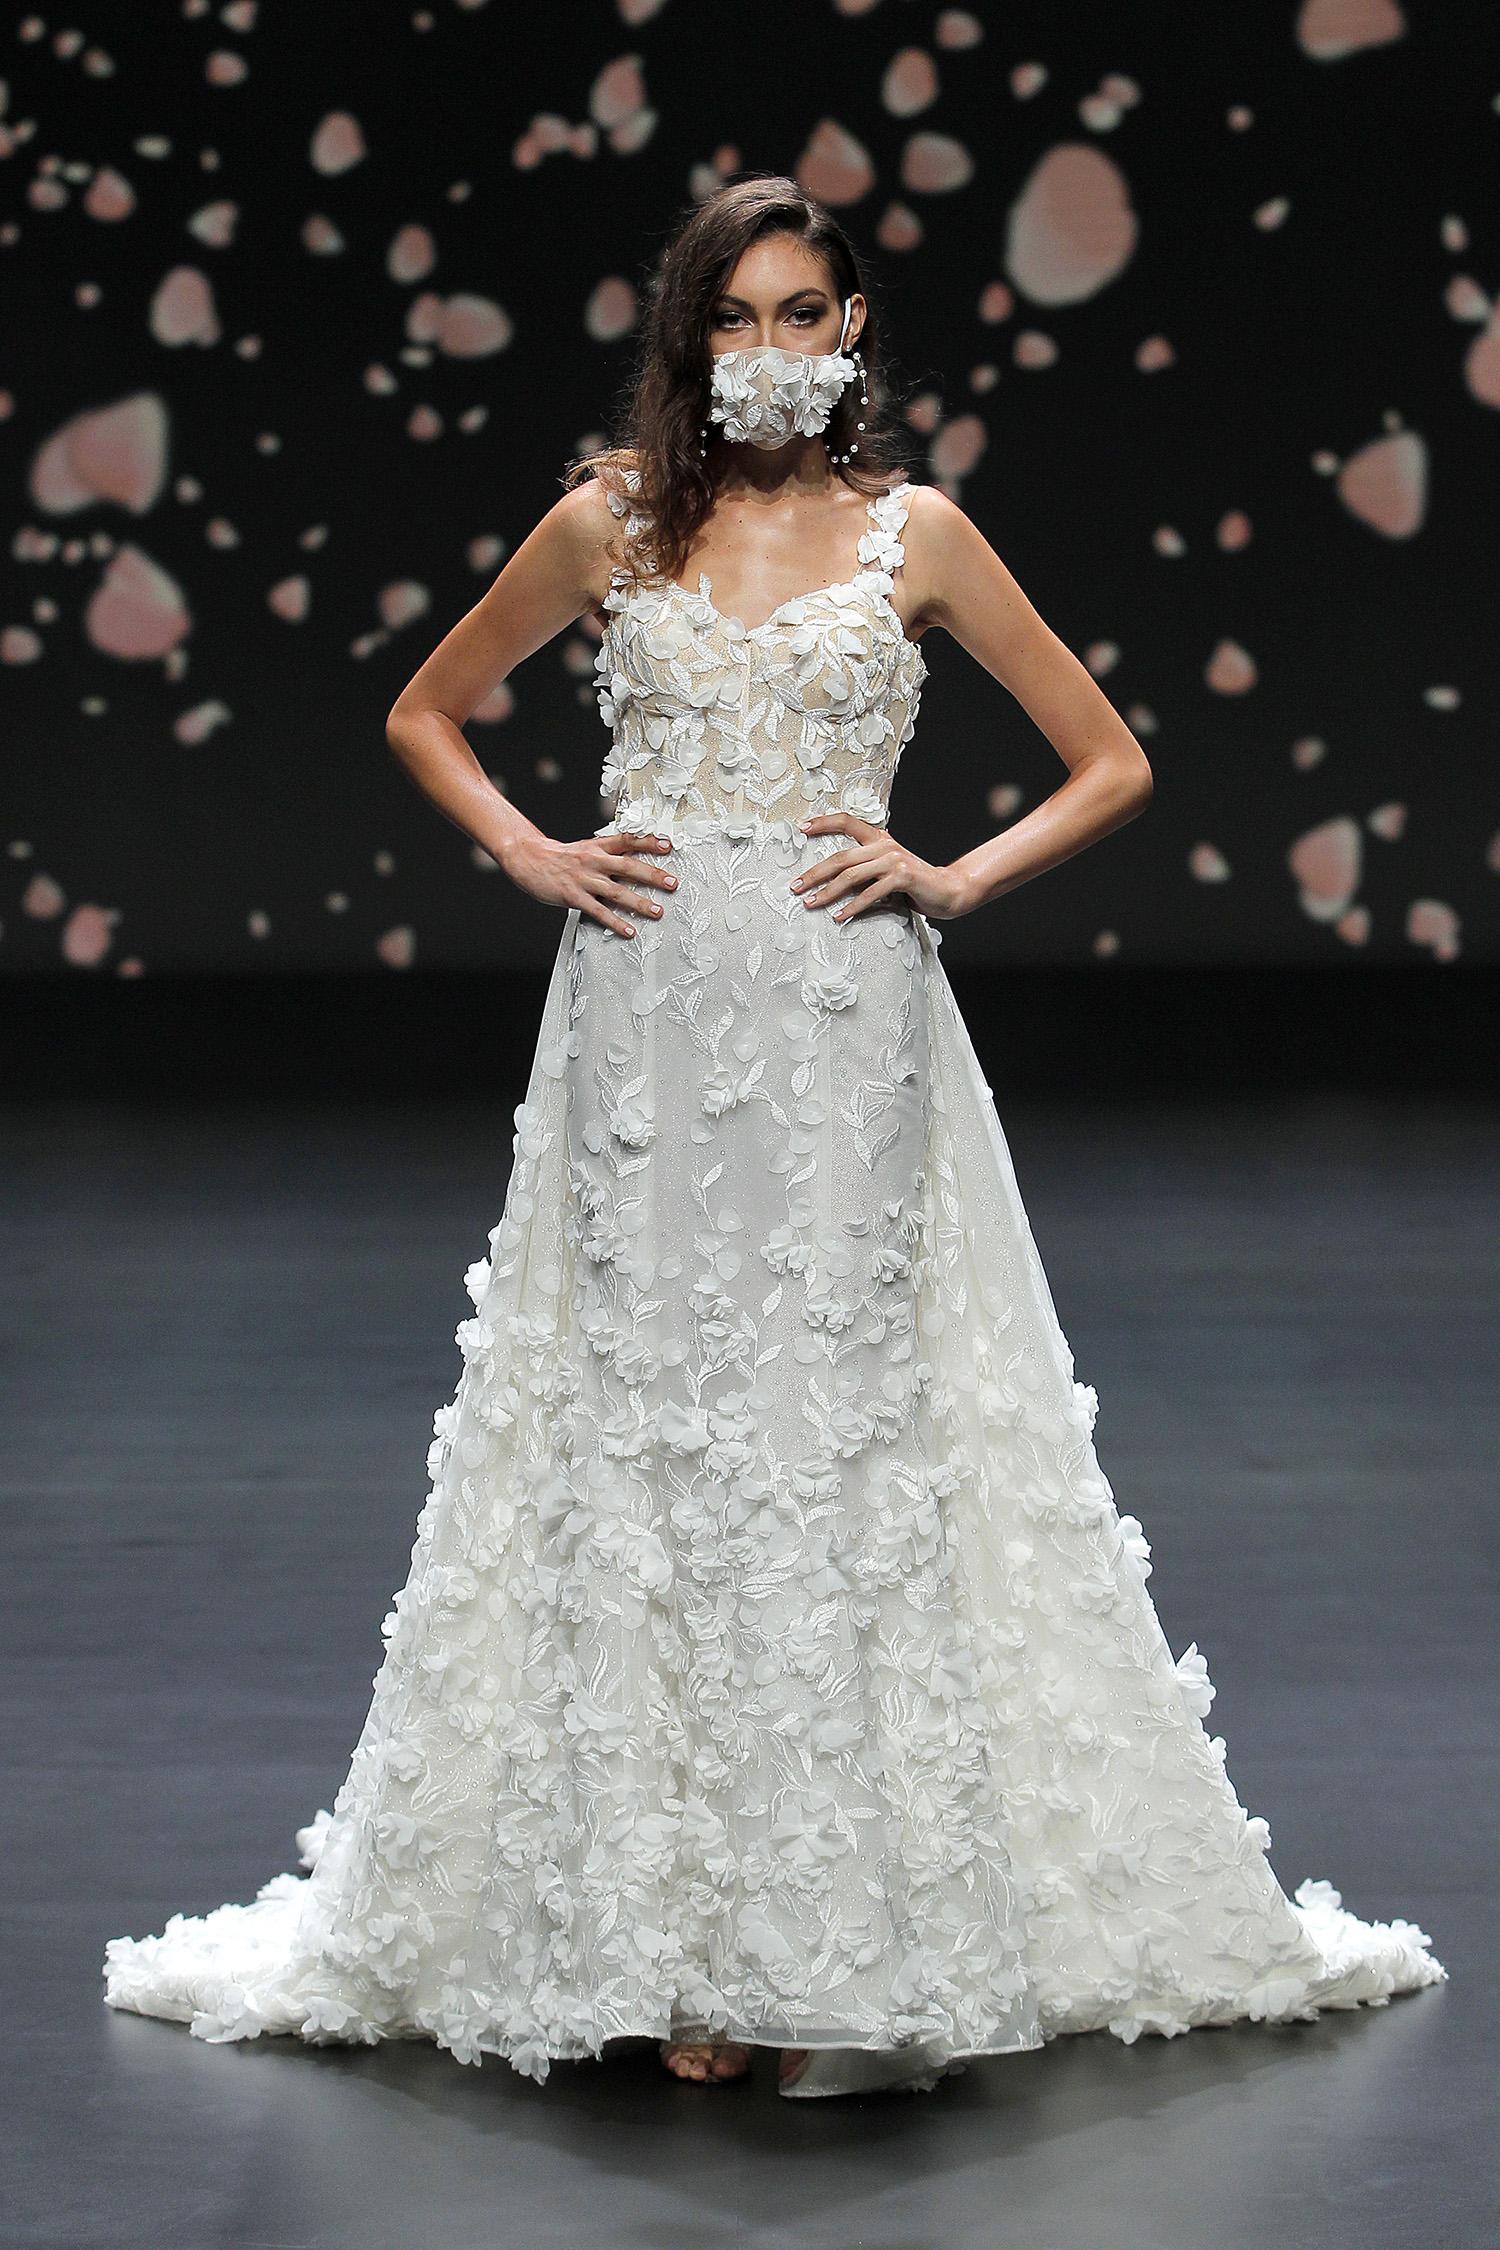 bridal face mask